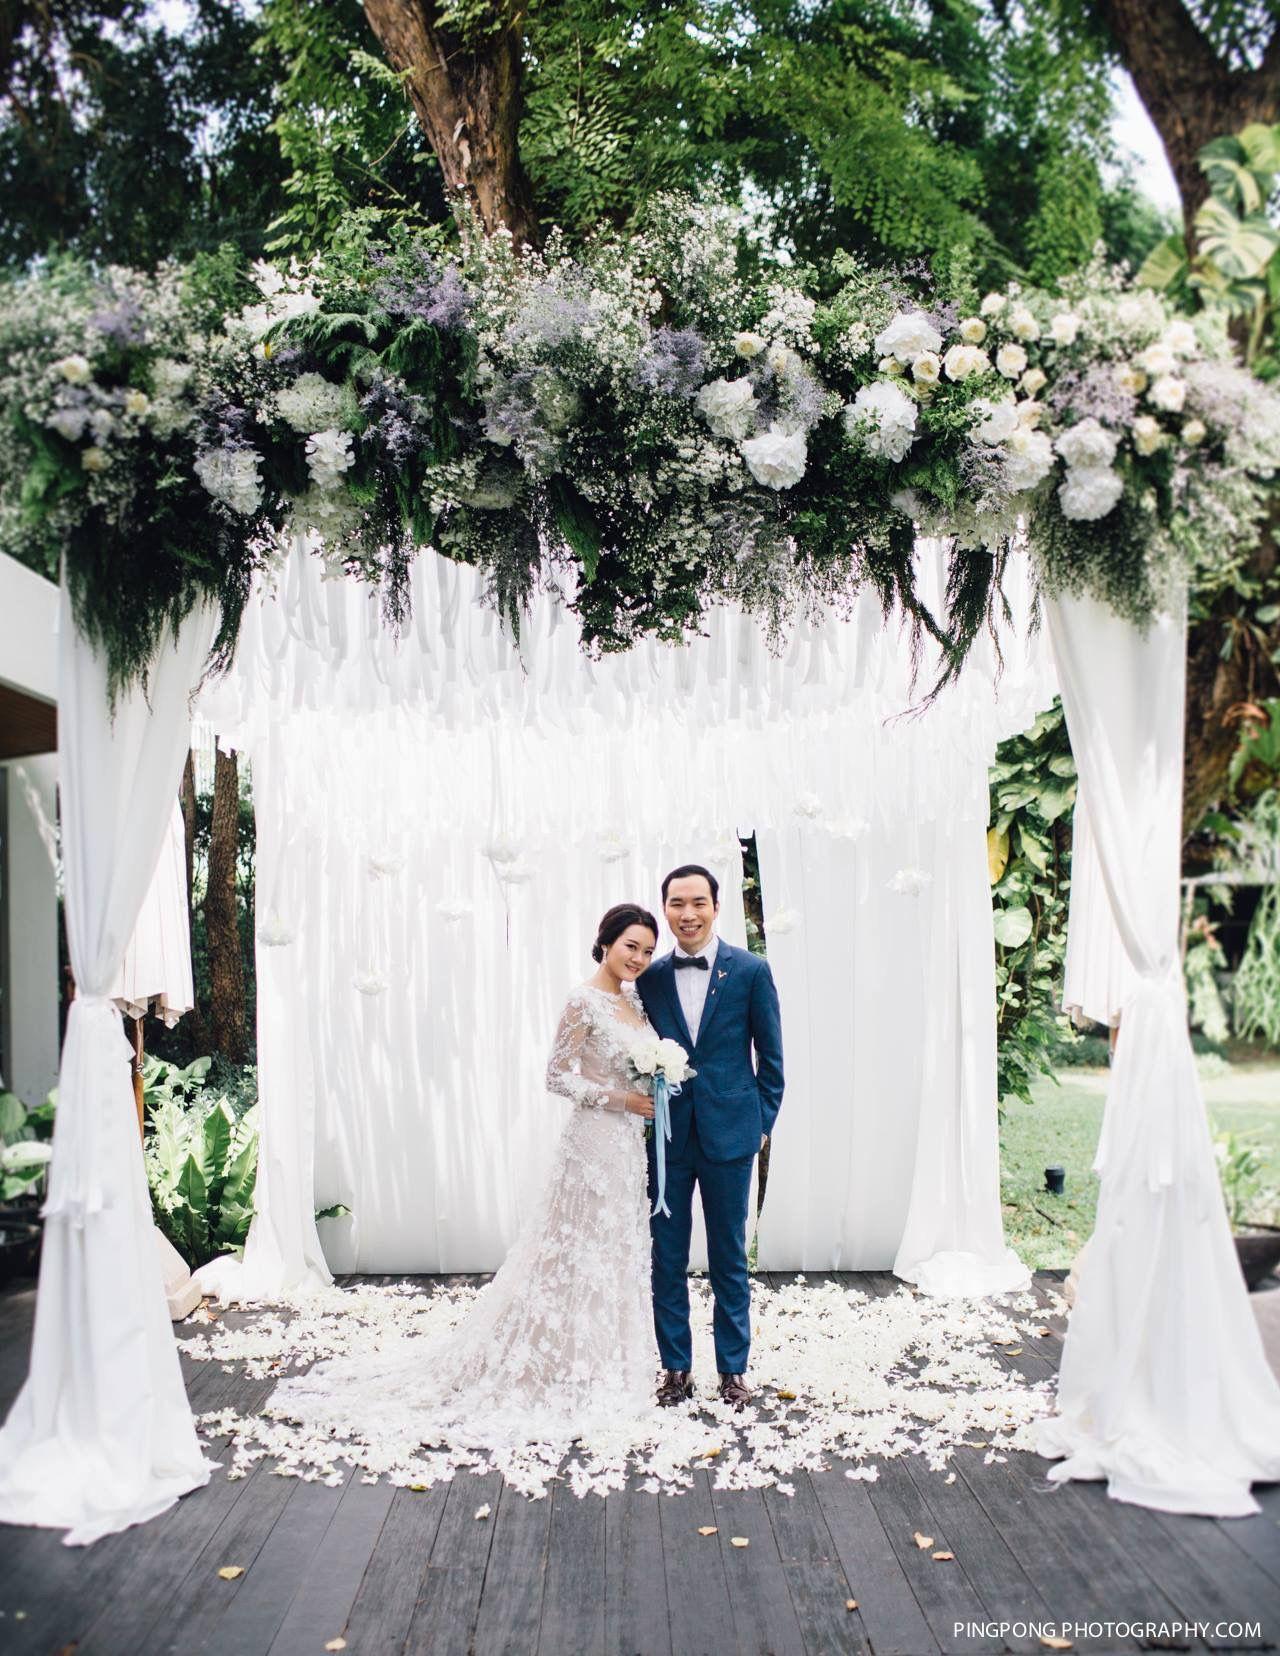 Pin by Far Away on Wedding ideas | Pinterest | Backdrops, Wedding ...